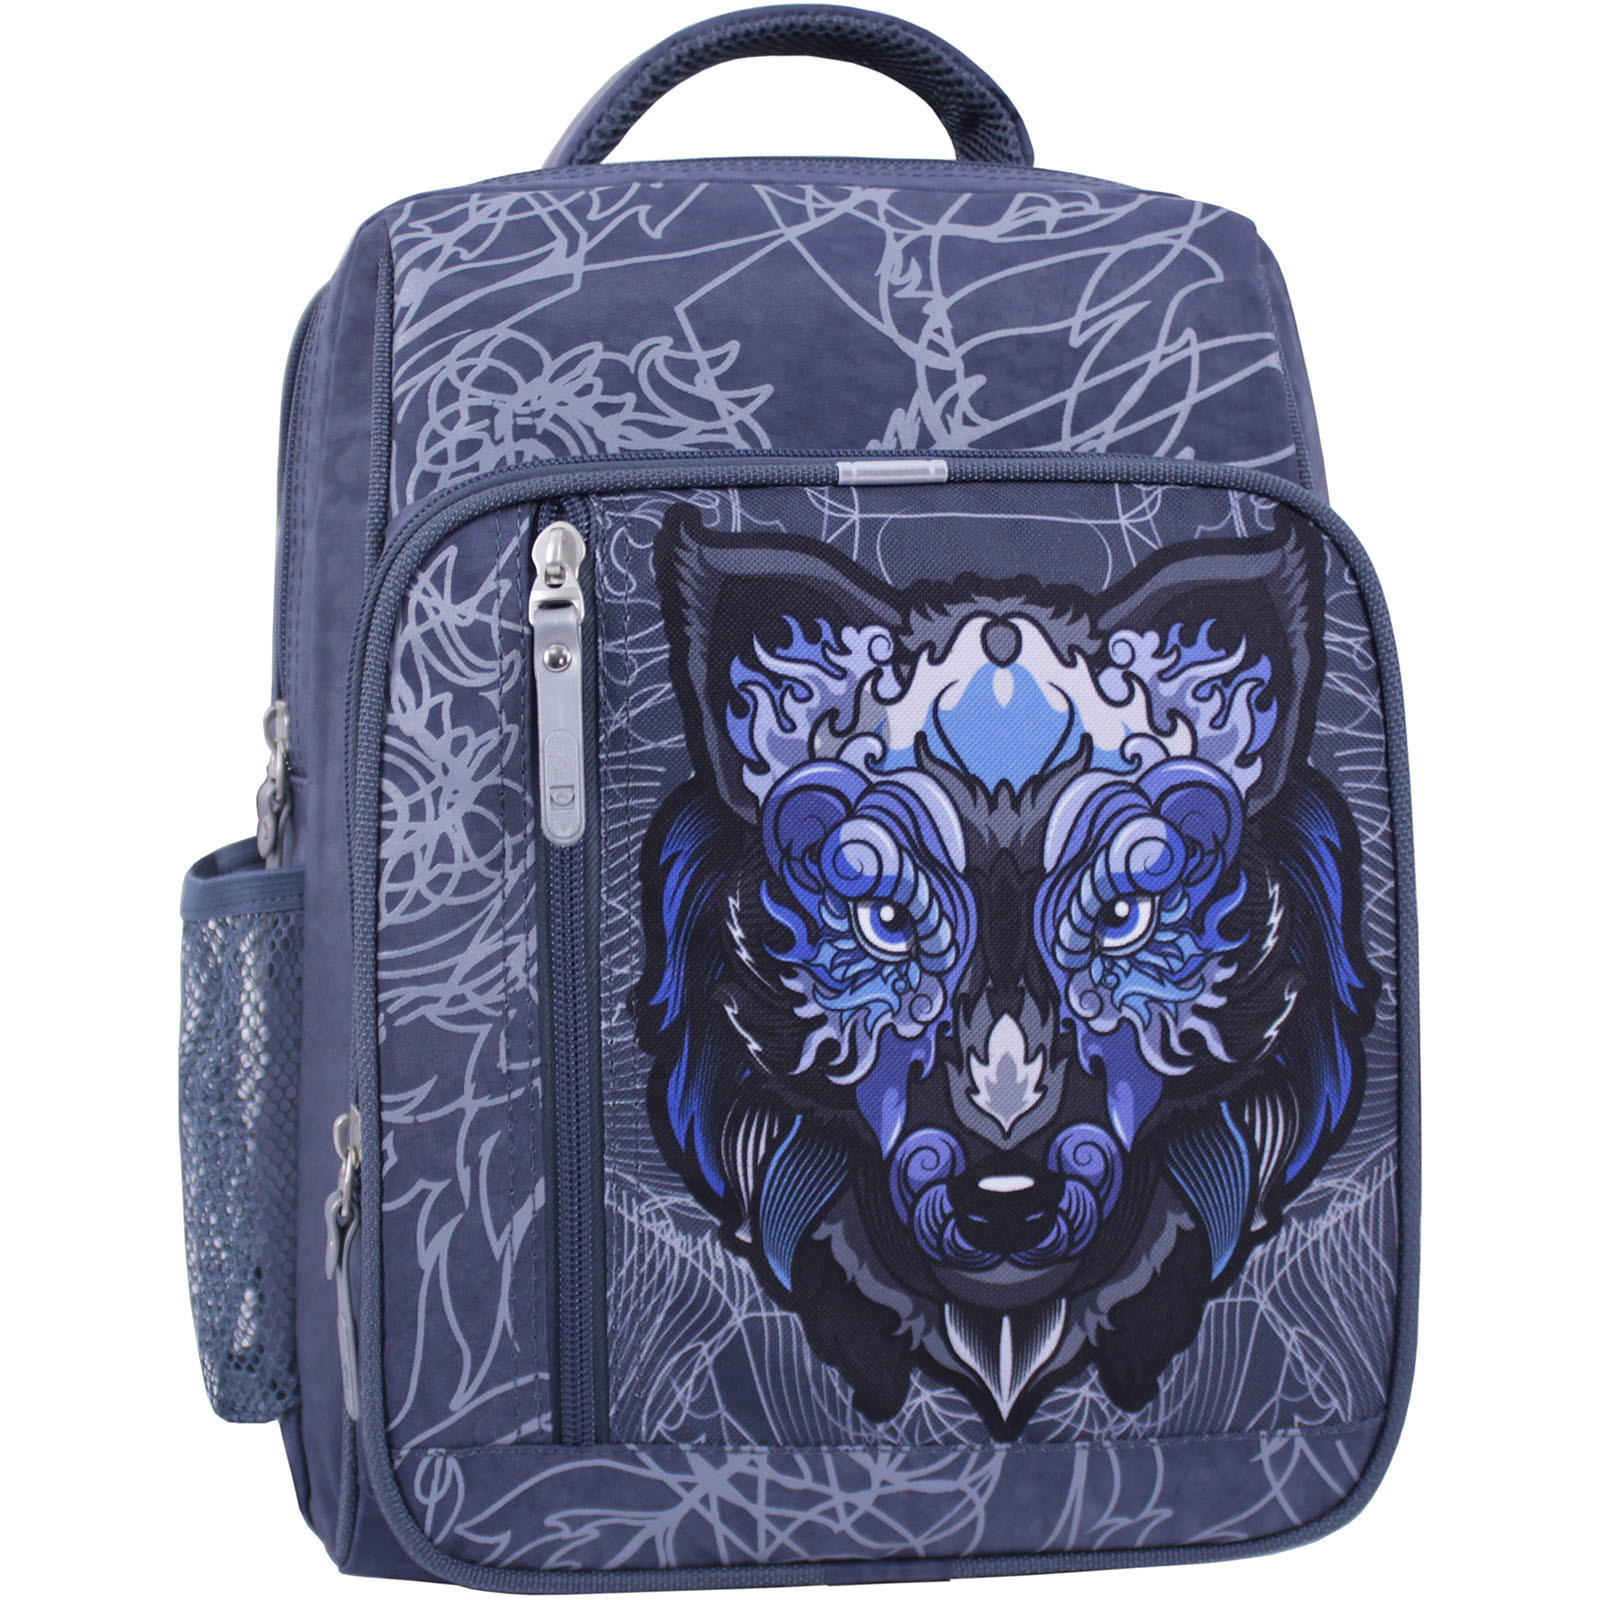 Школьные рюкзаки Рюкзак школьный Bagland Школьник 8 л. 321 серый 506 (00112702) IMG_1551_суб.506_.JPG